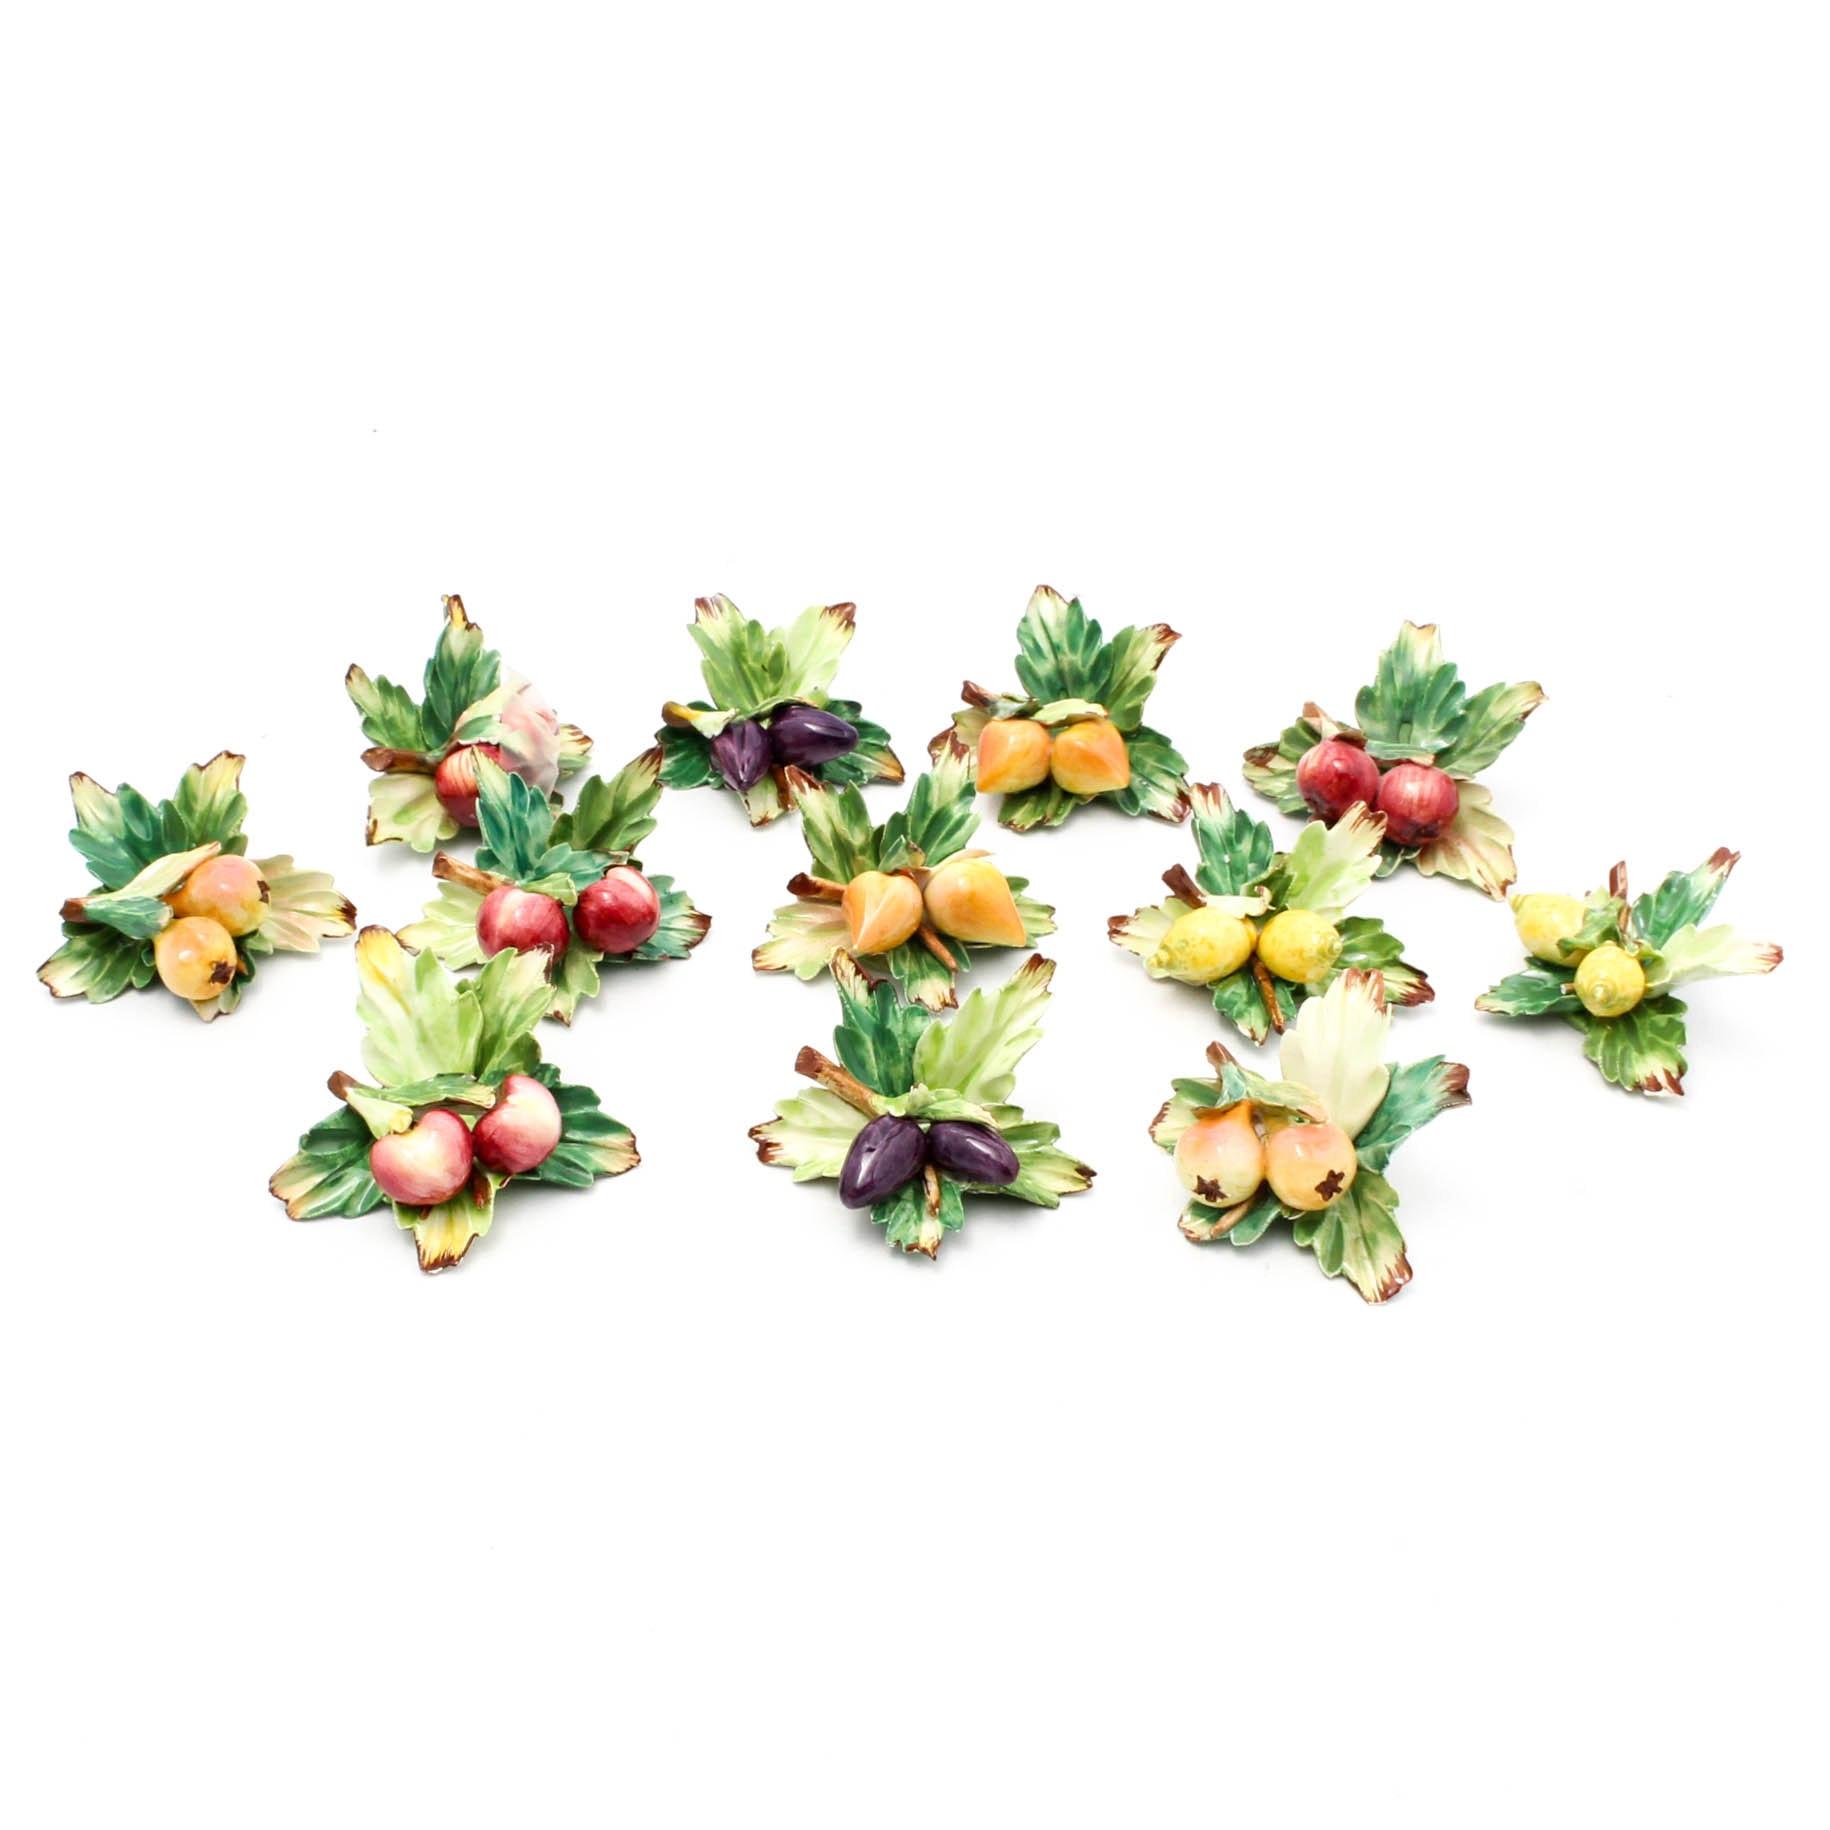 Italian Hand-Painted Porcelain Fruit Figurines